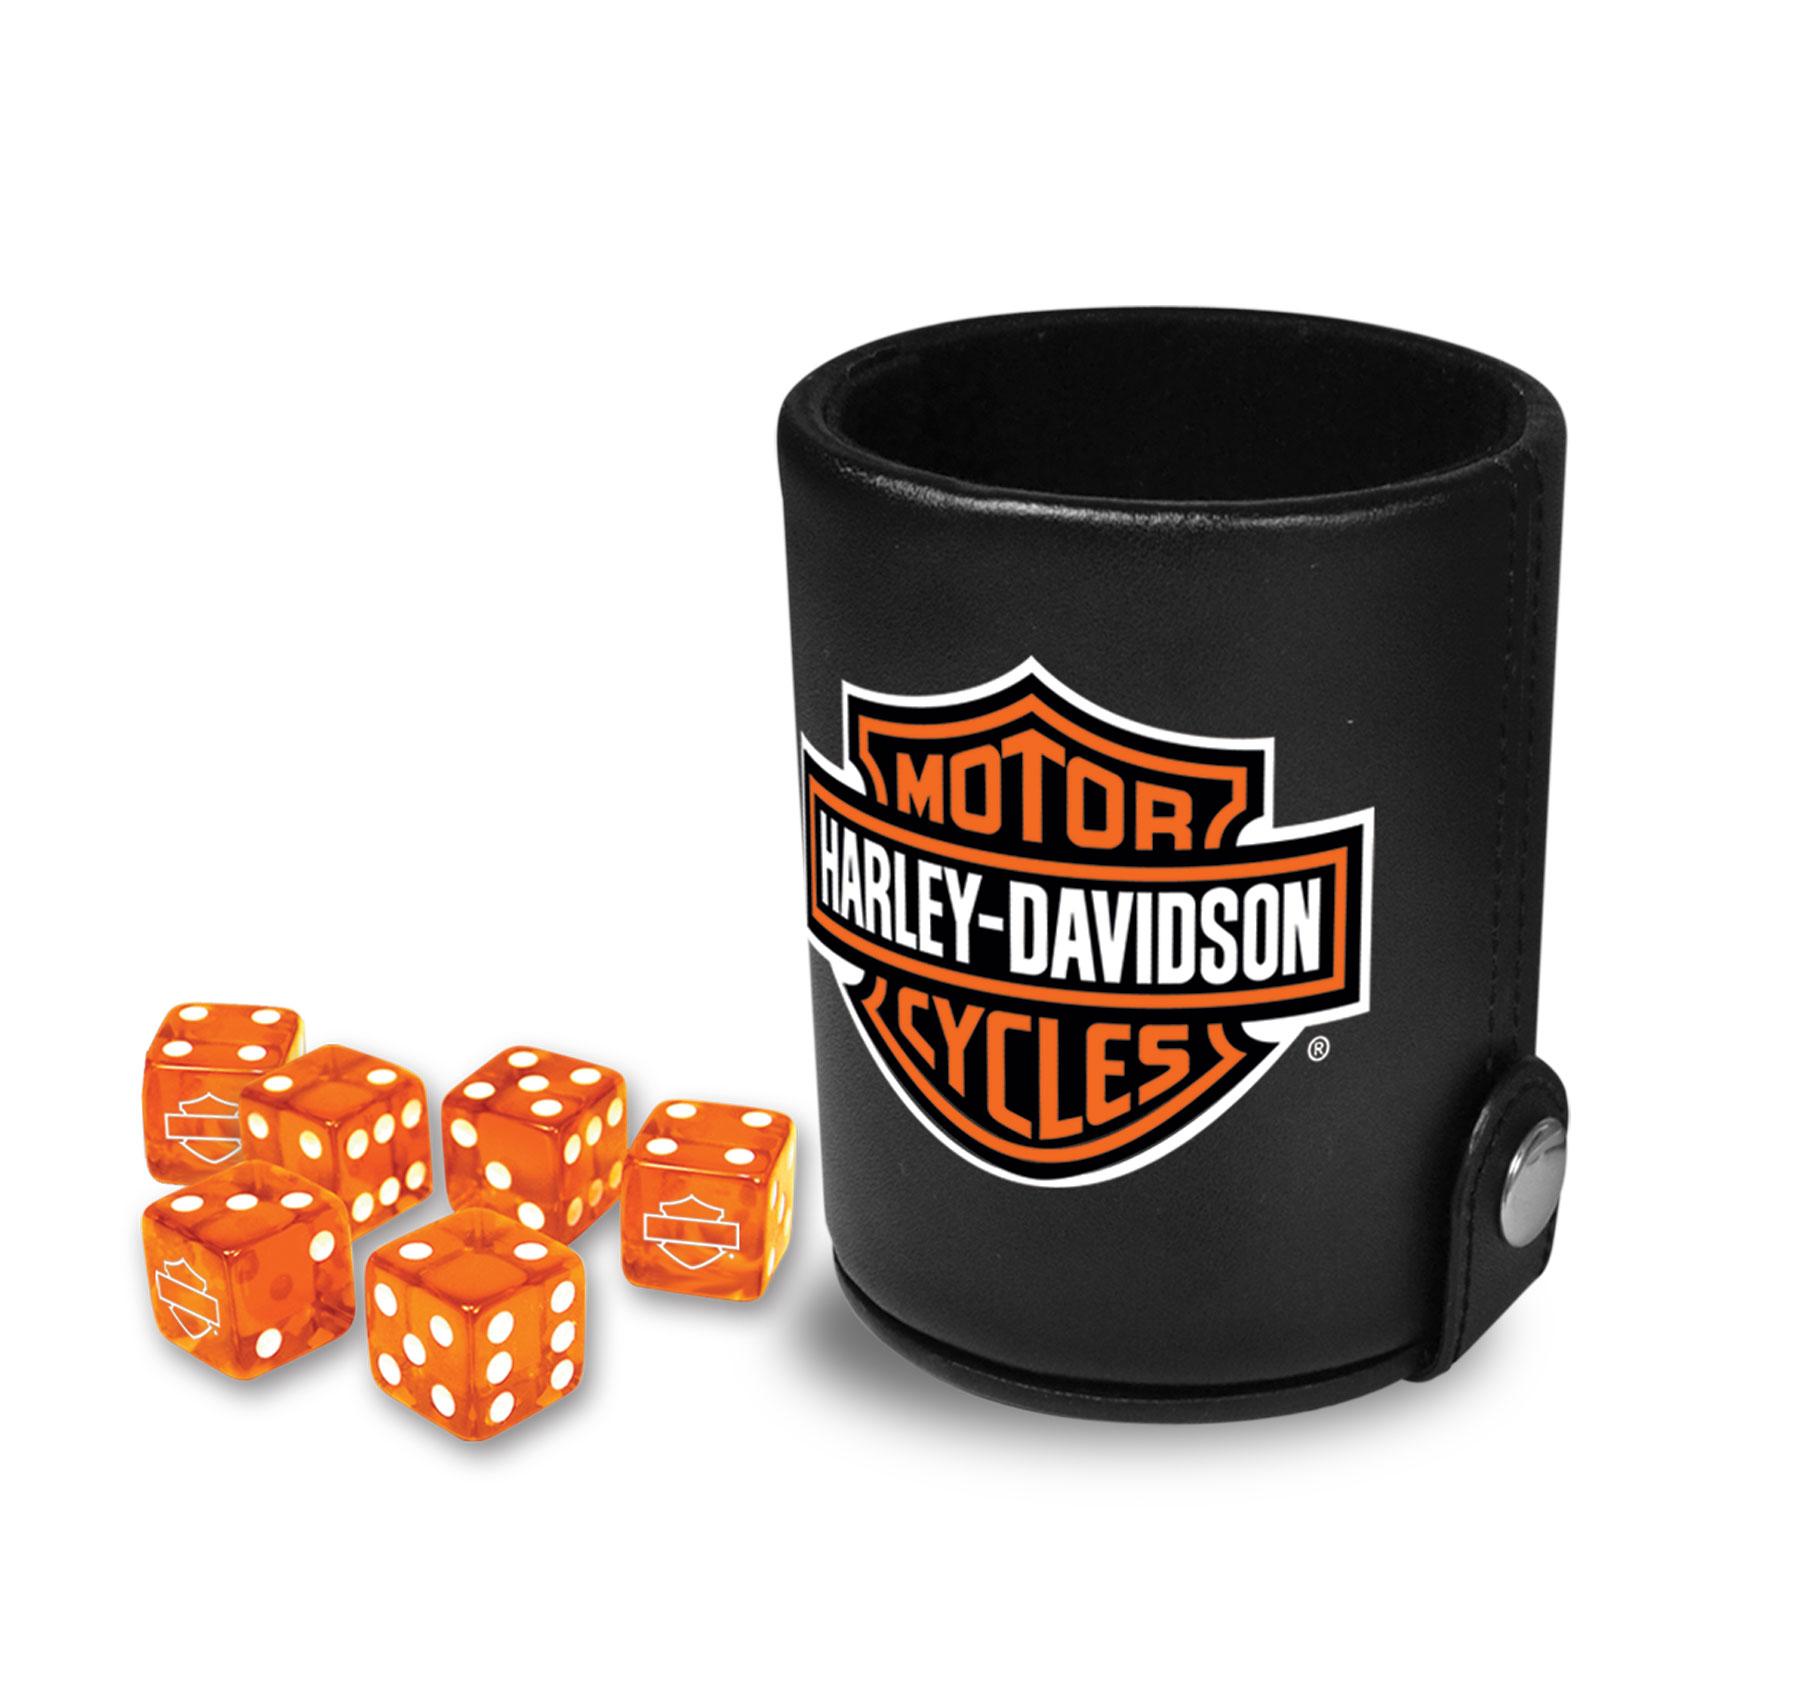 Harley-Davidson® Bar & Shield® Dice Cup with Dice